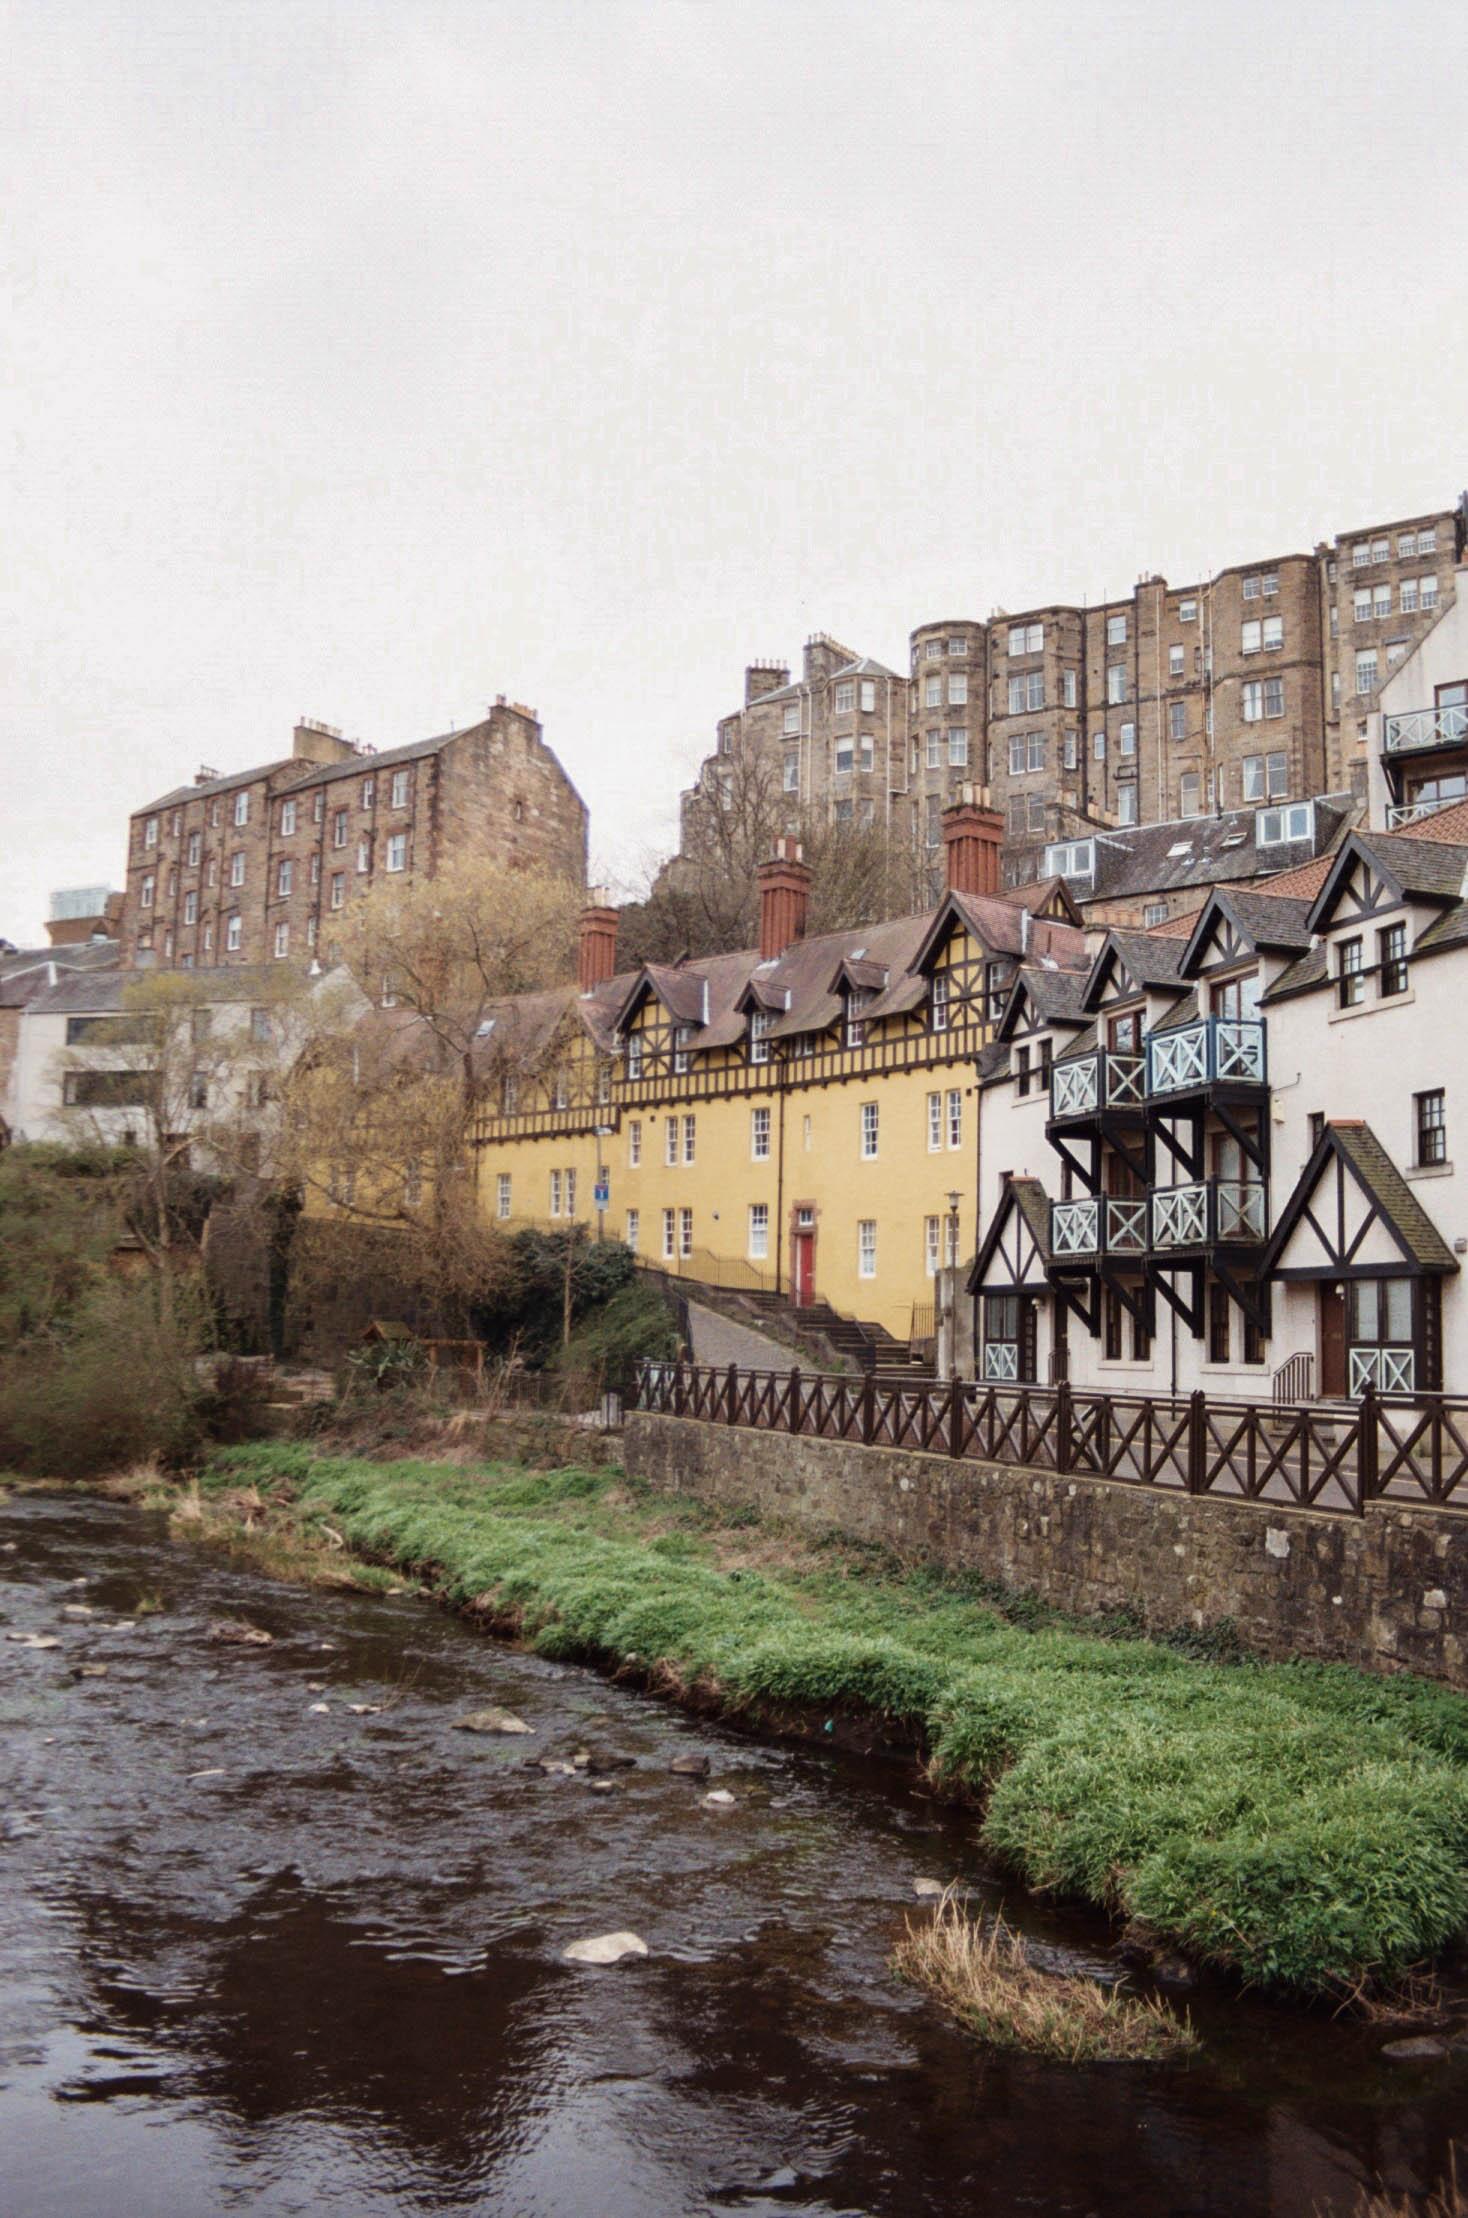 Dean Village in Edinburgh on a cloudy day.